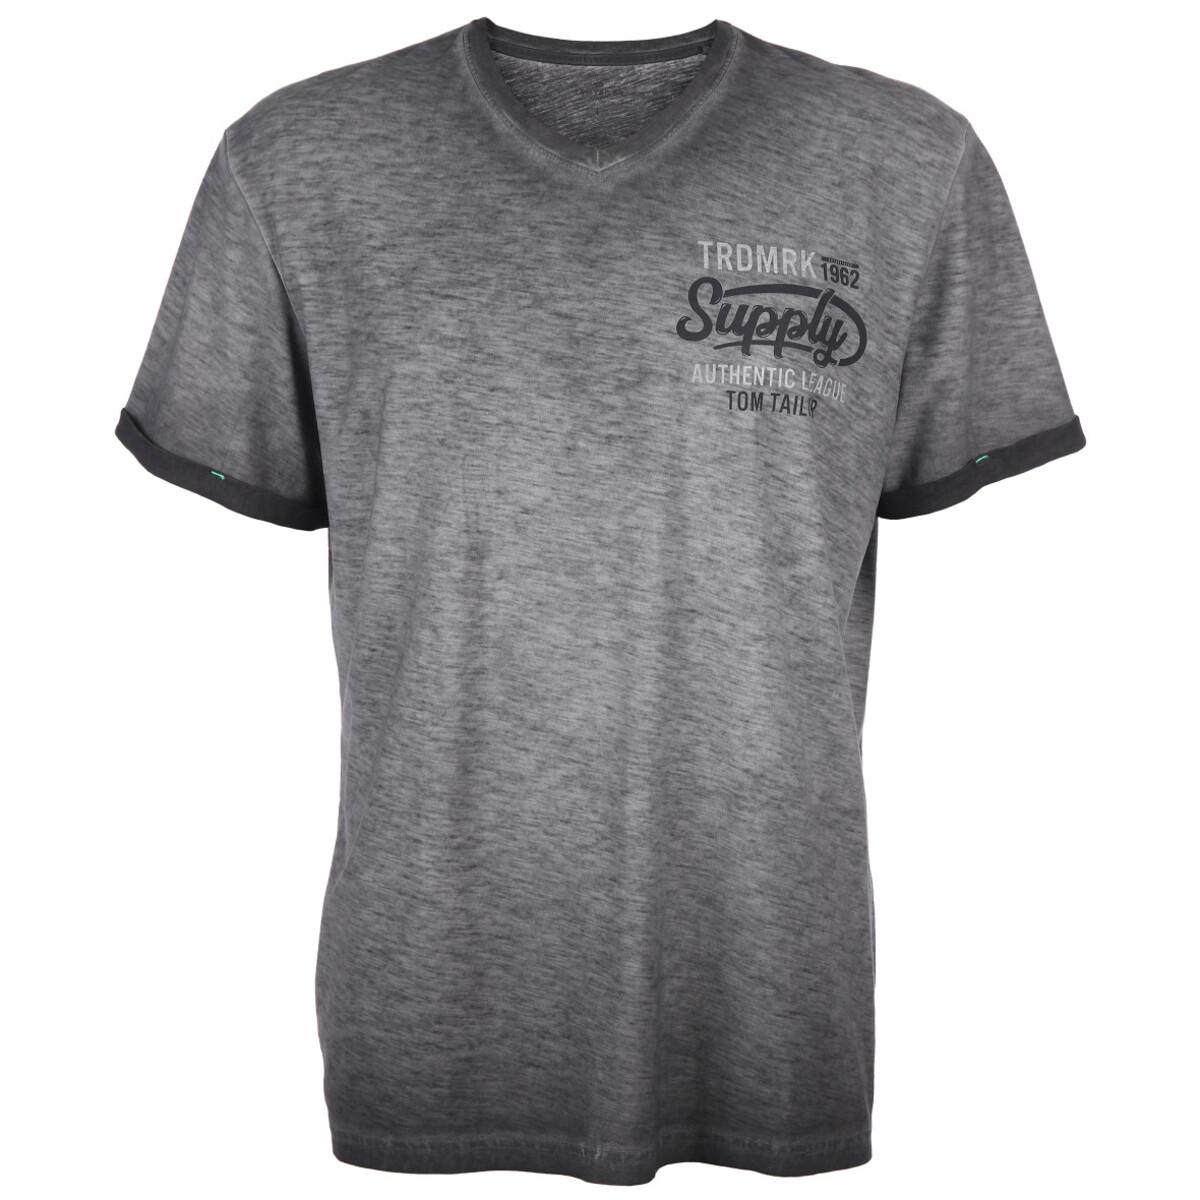 Bild 1 von Herren T-Shirt in melierter Optik